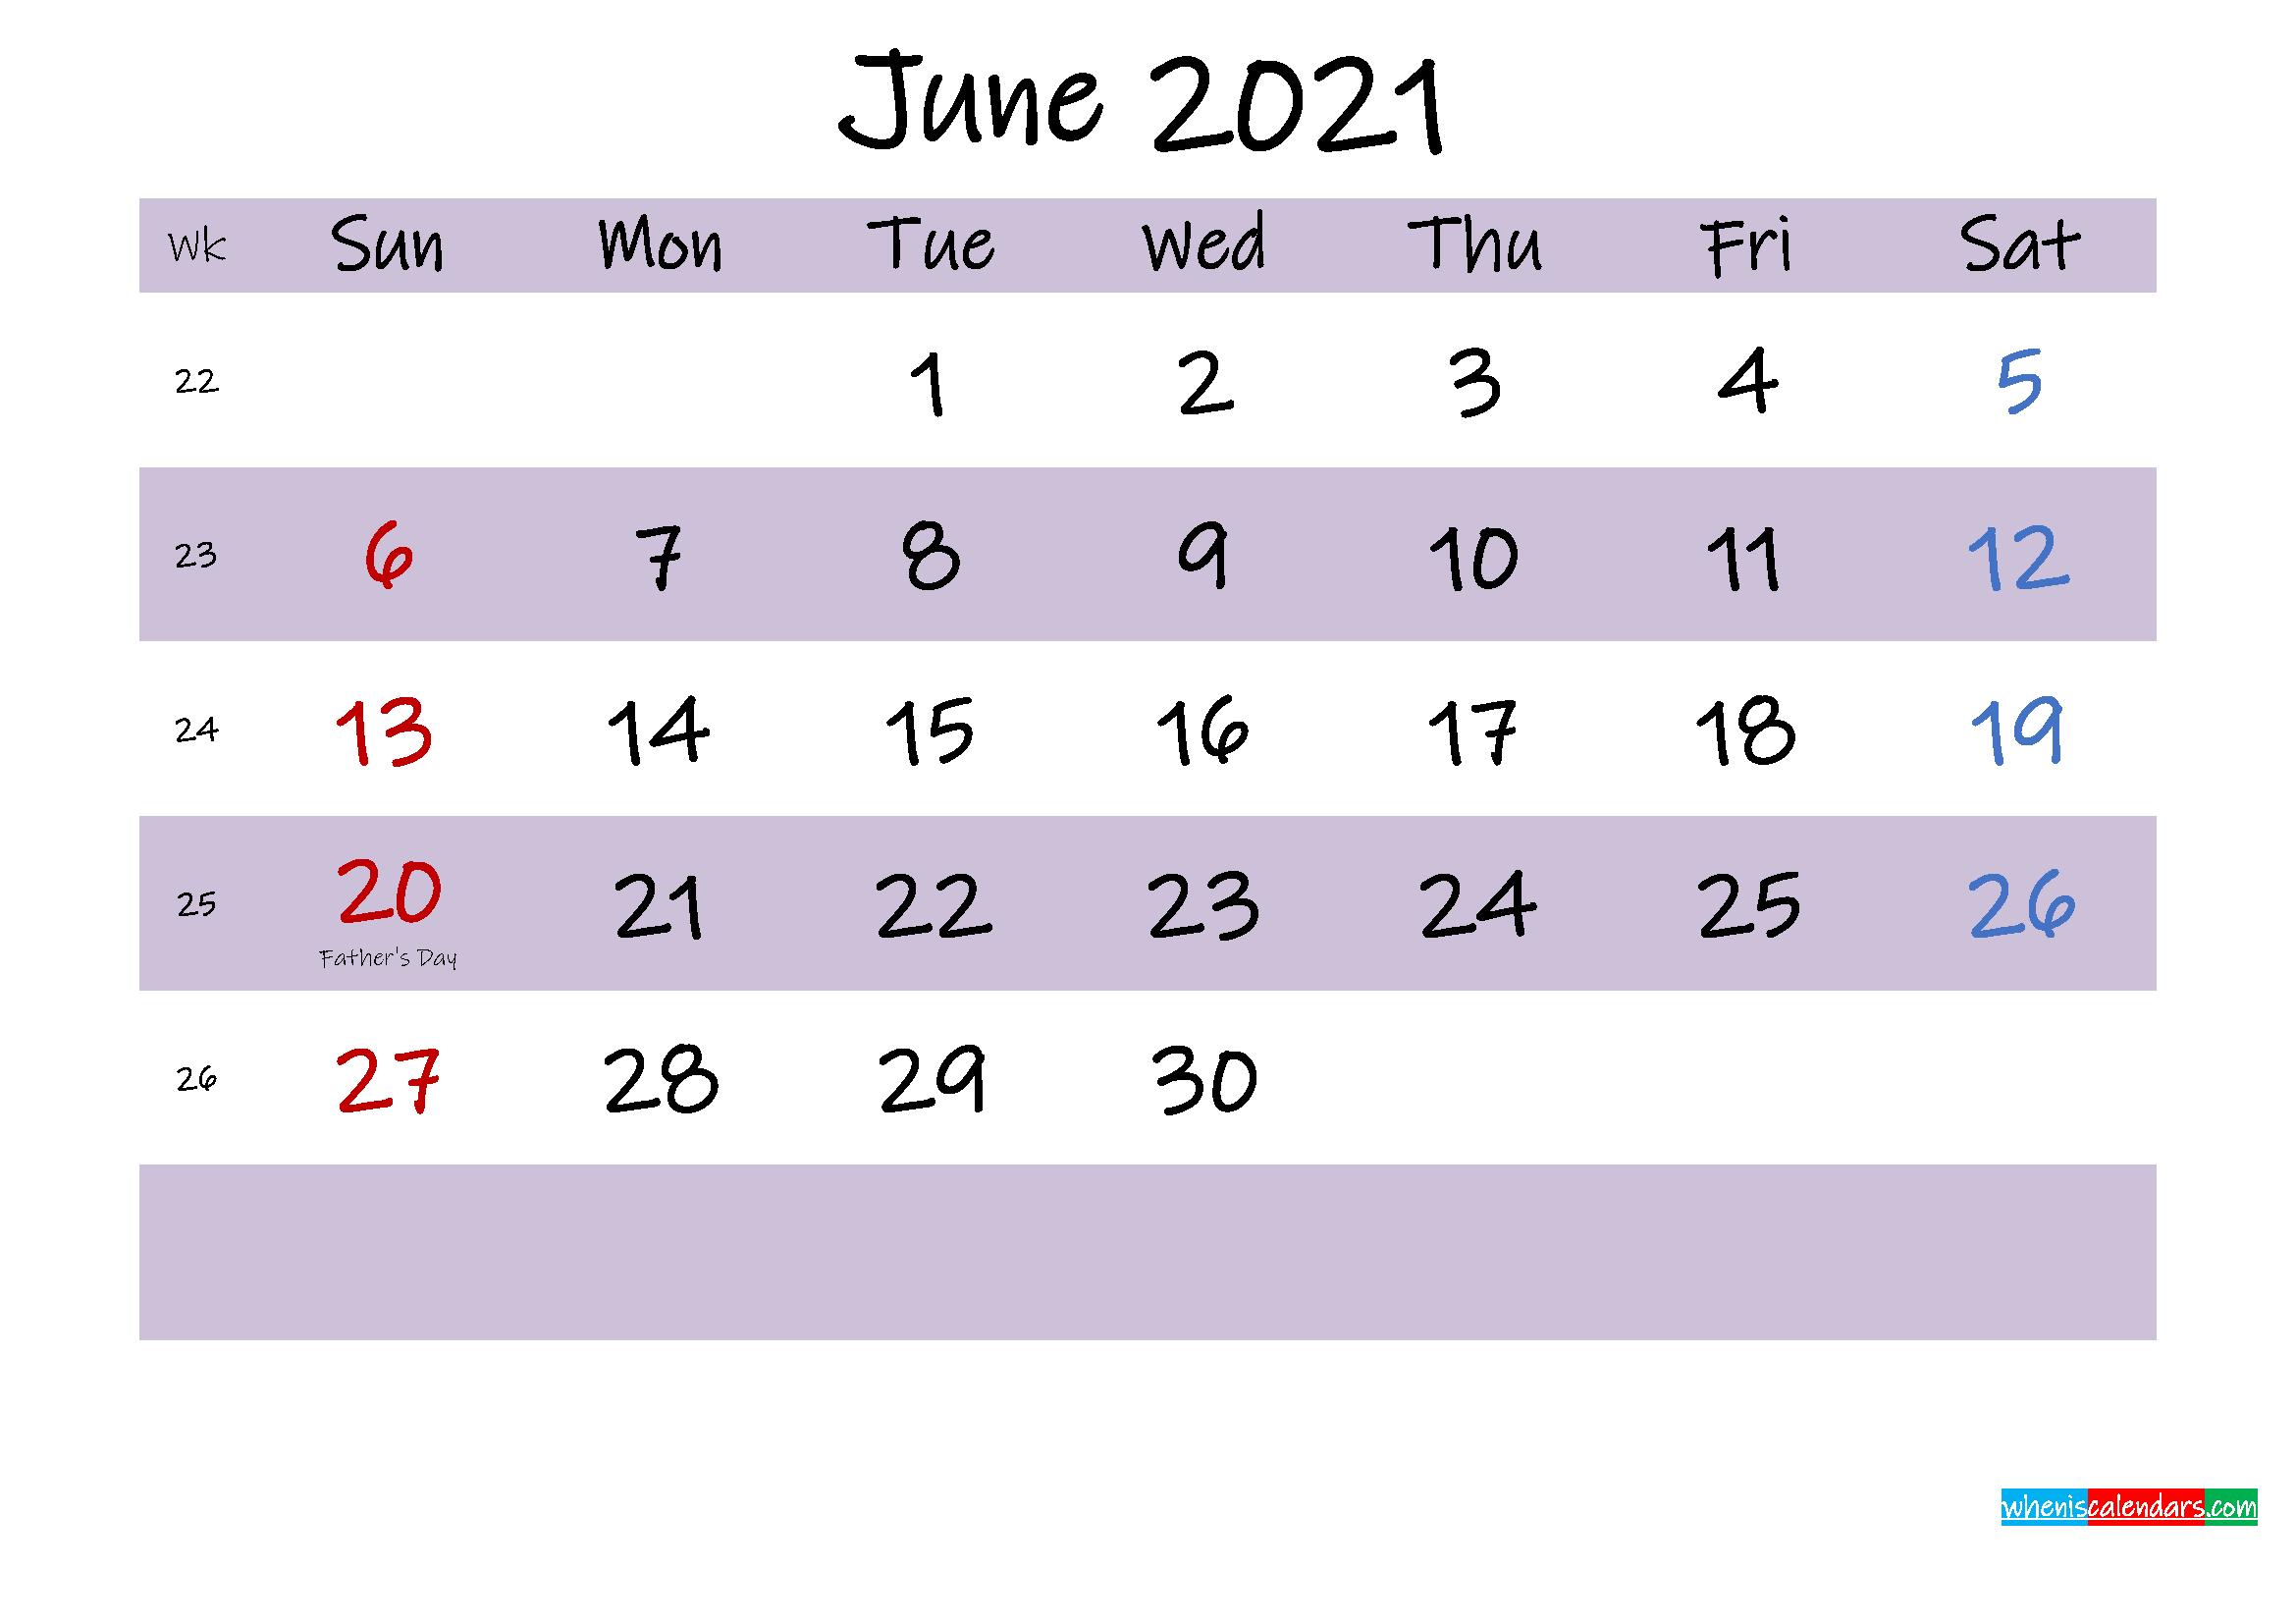 June 2021 Calendar with Holidays Printable